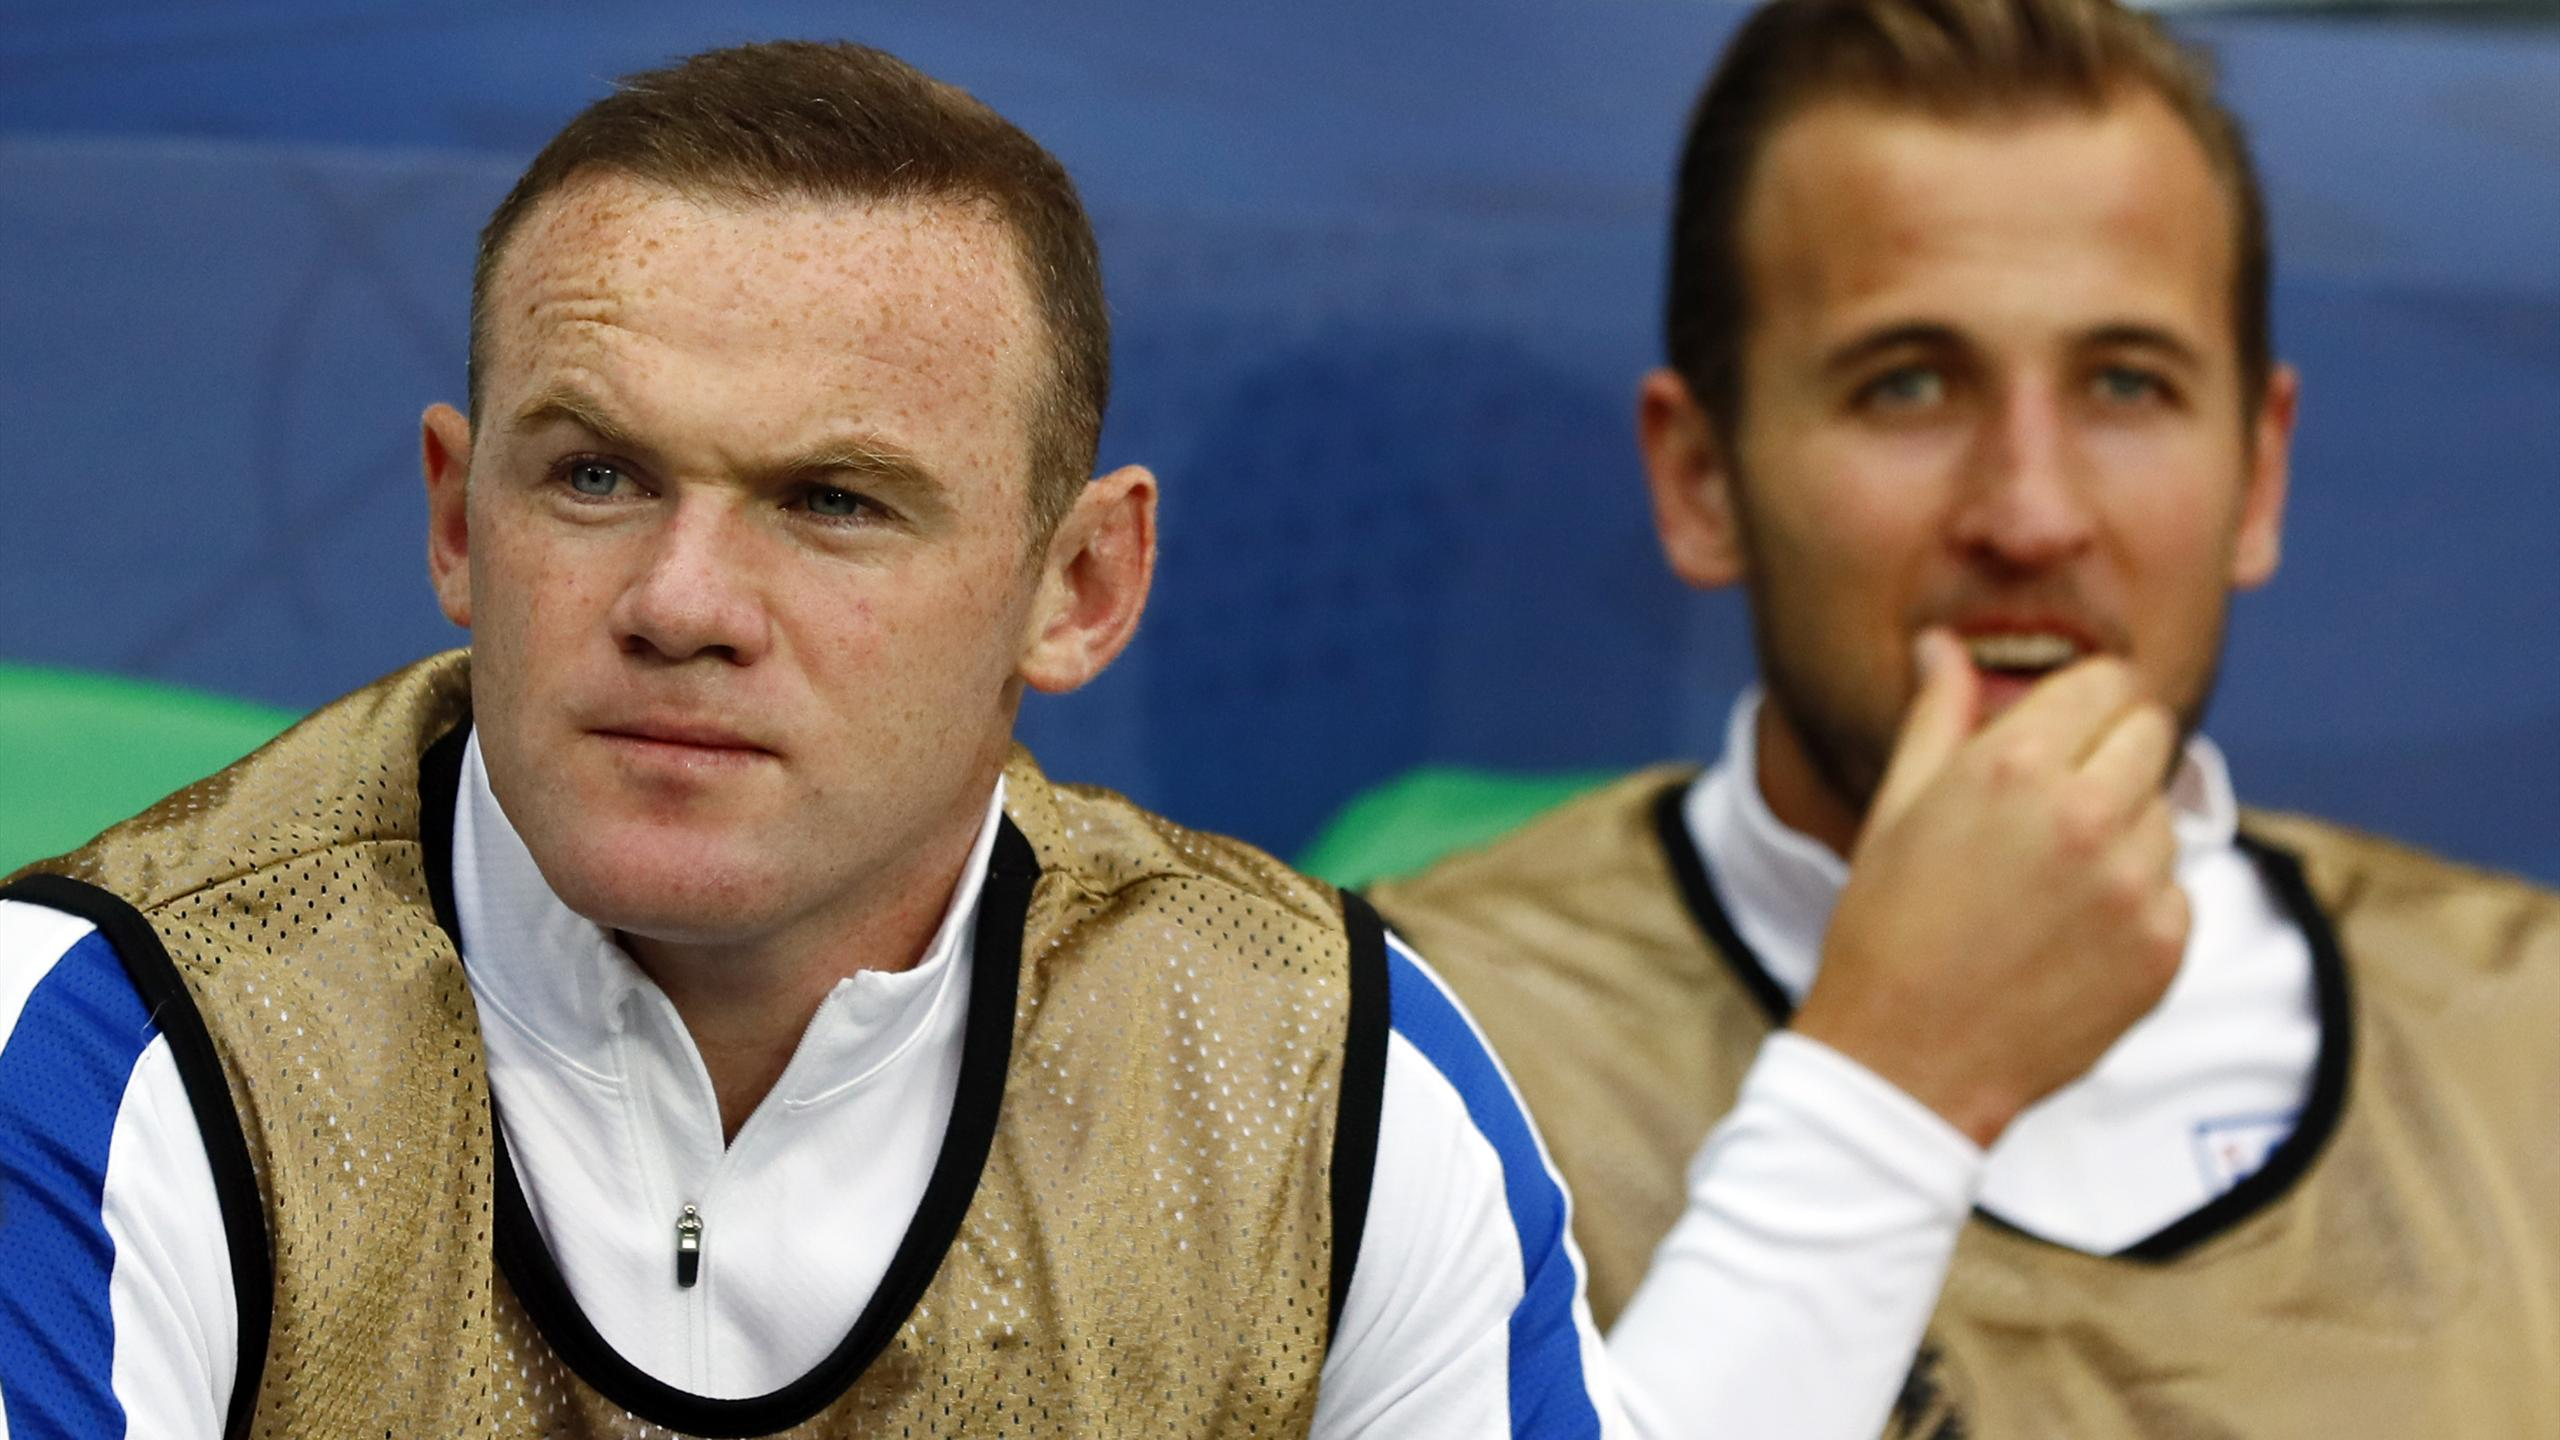 England's Wayne Rooney and Harry Kane